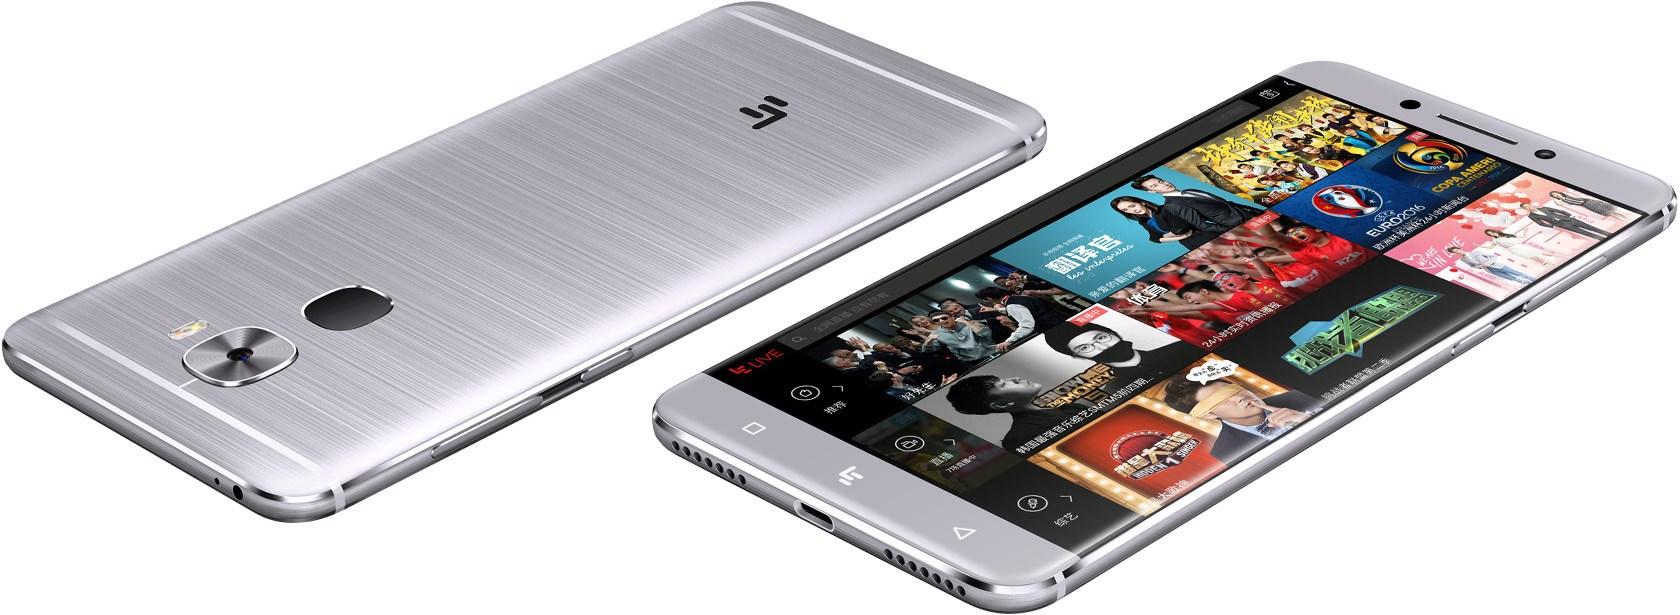 [Gearbest] LeEco Le Pro 3 Elite 4GB / 32GB für 141,74 € - 28% Ersparnis